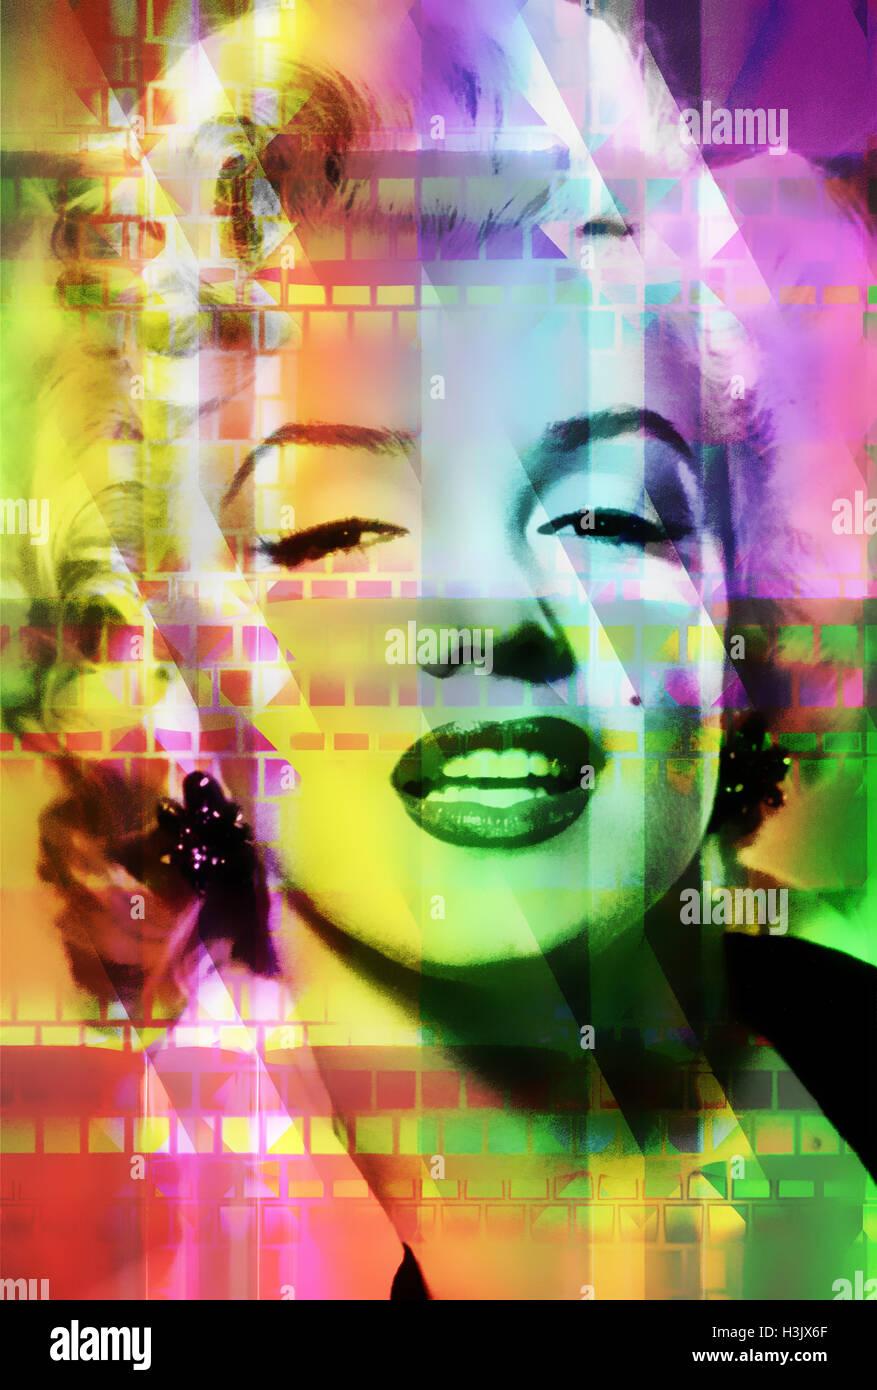 Marilyn Monroe pop art version - Stock Image